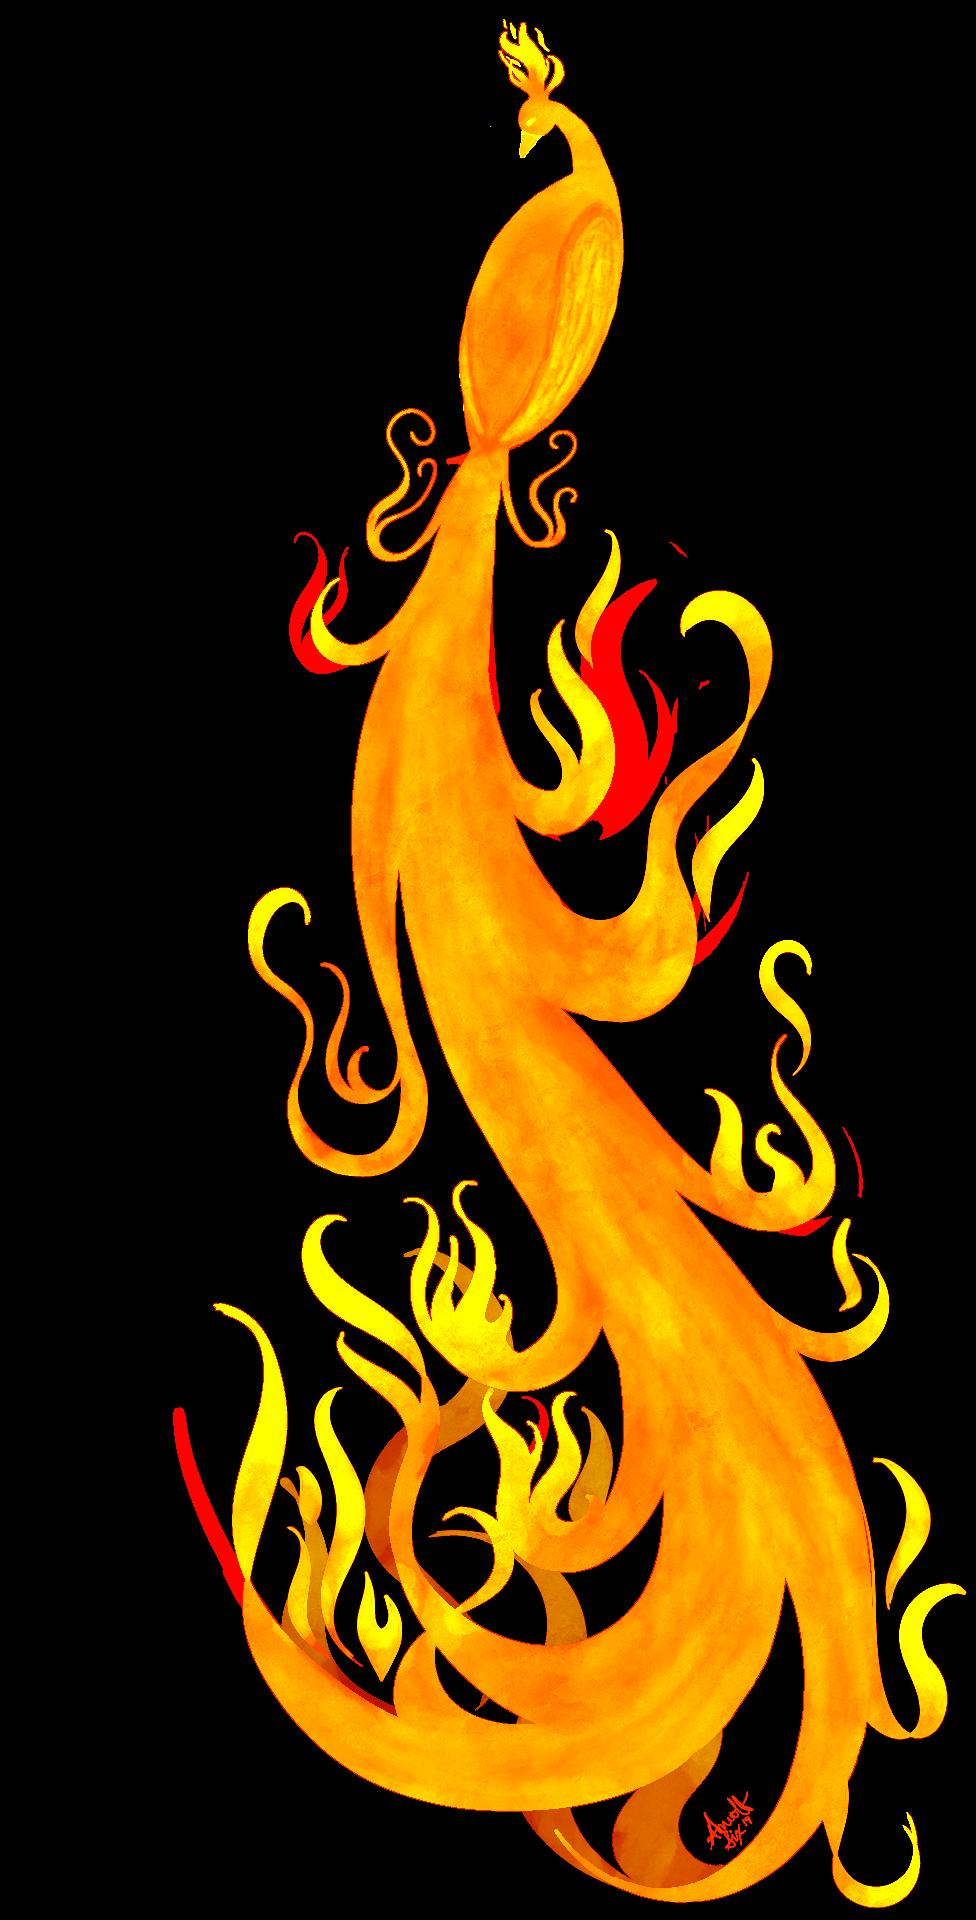 Phoenix [Commission]